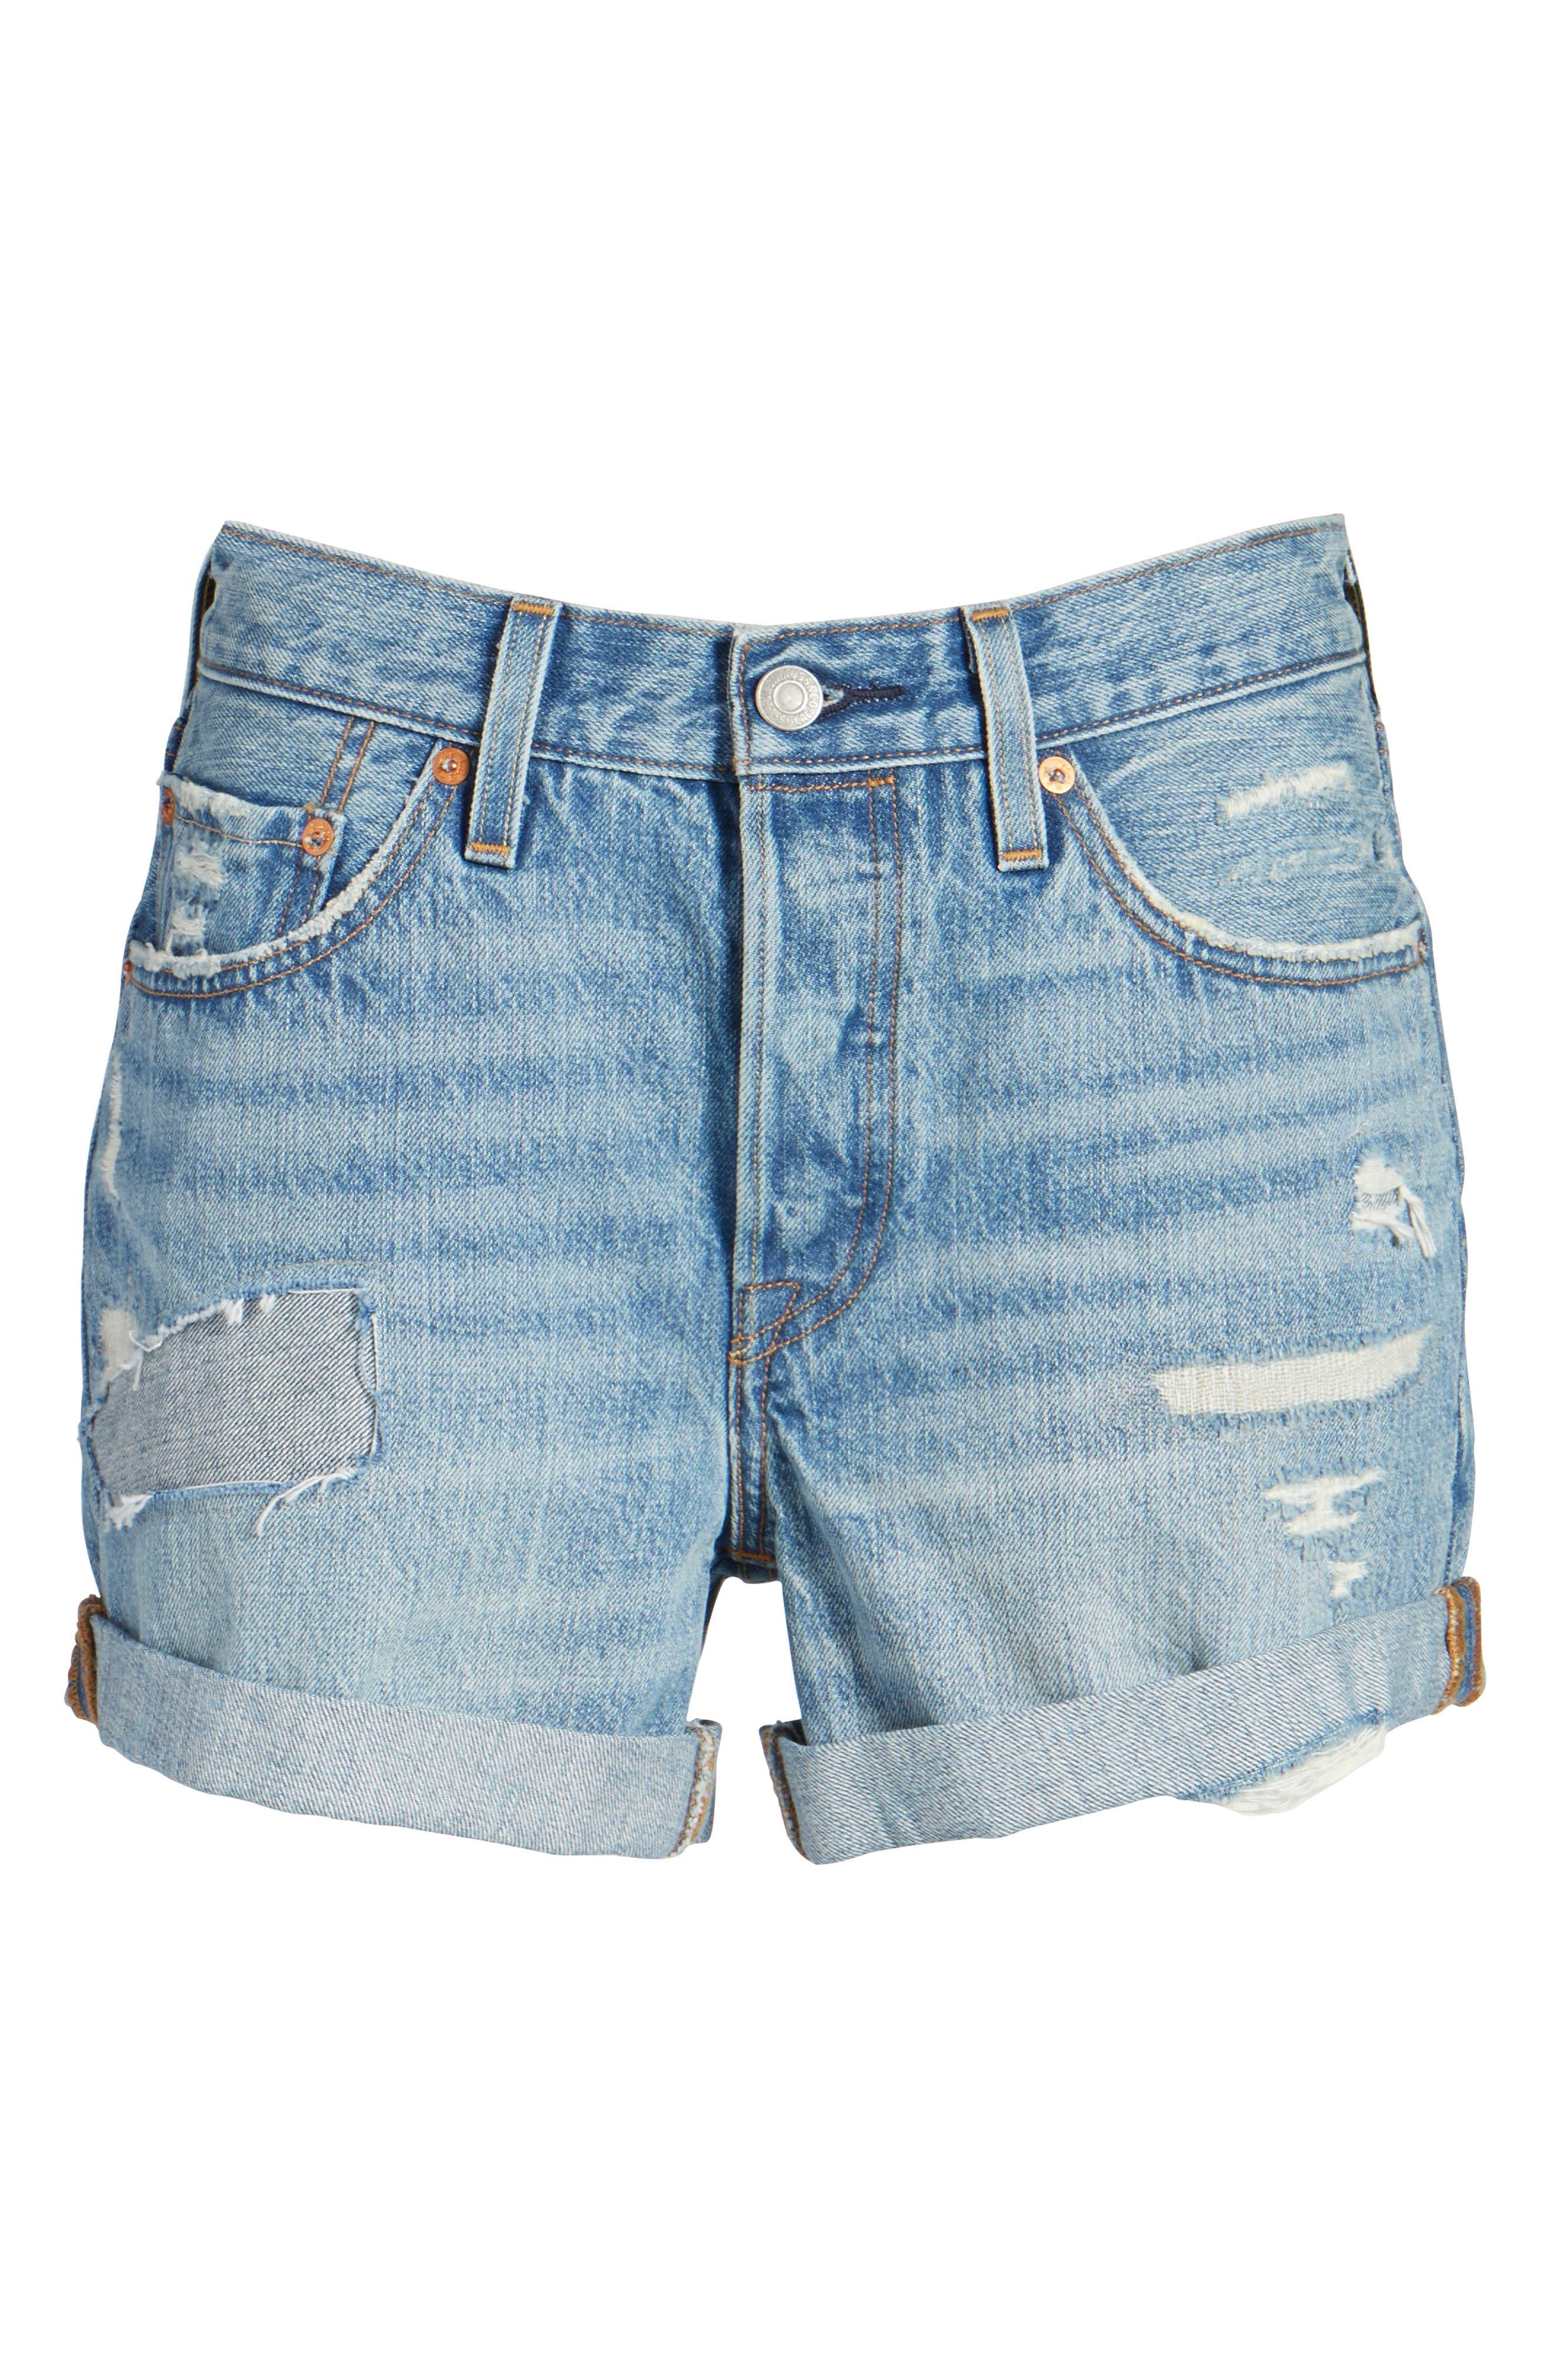 501 Long Denim Shorts,                             Alternate thumbnail 6, color,                             400